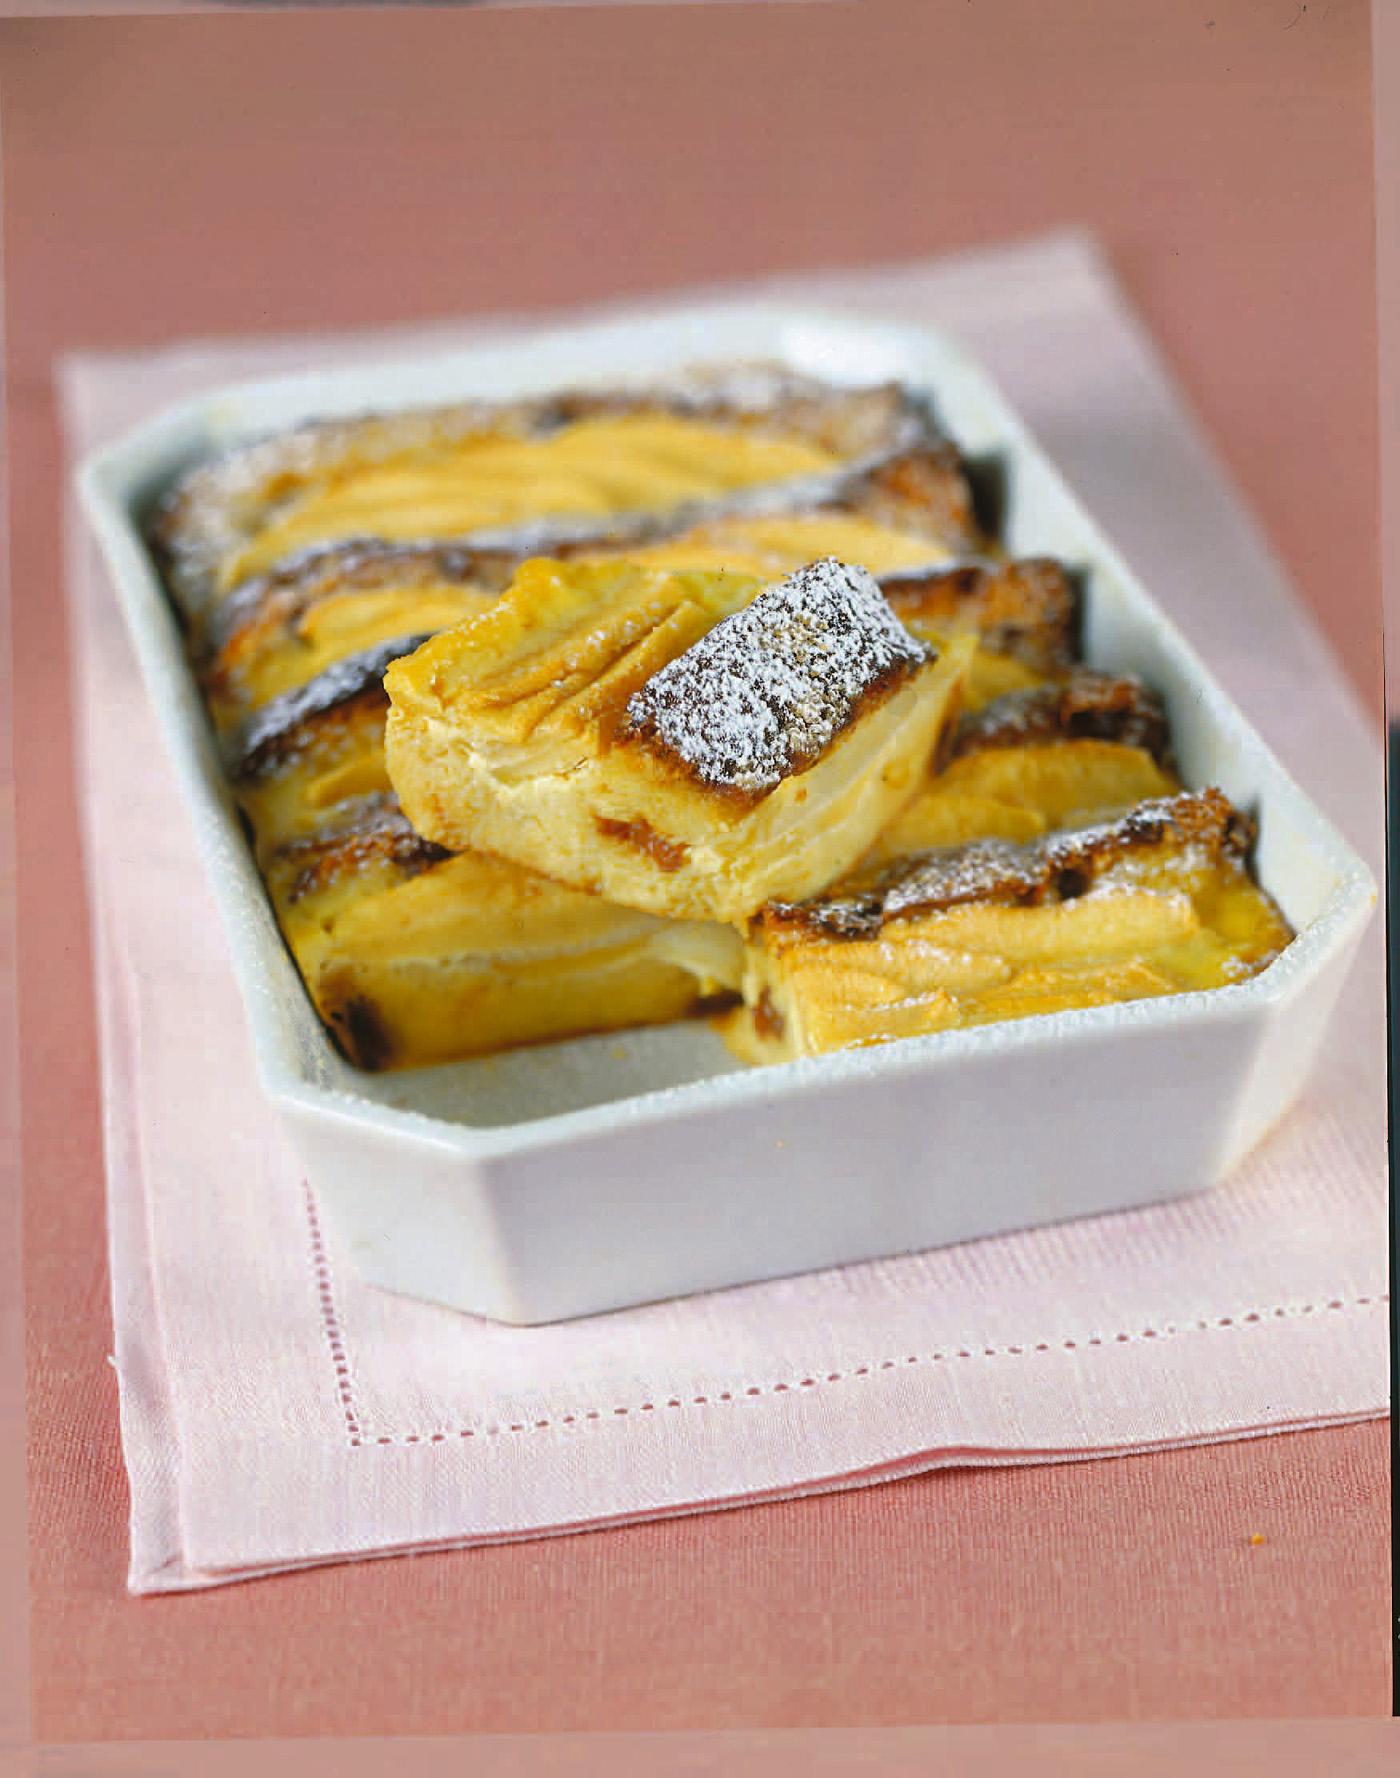 Budino di panettone e mele sale pepe - Immagini stampabili di mele ...